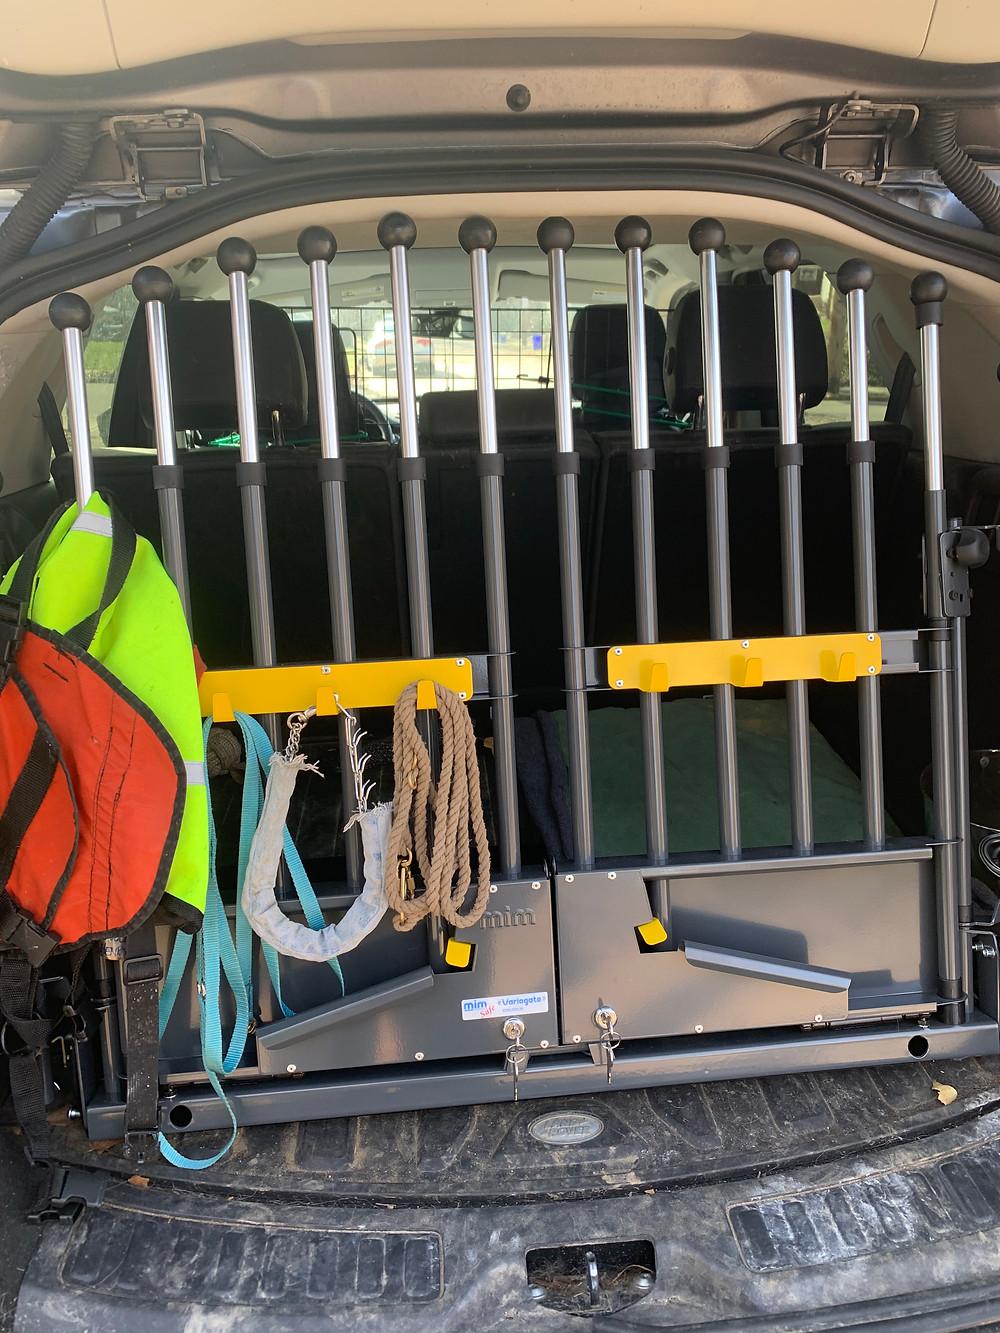 dog safety gate in back of SUV